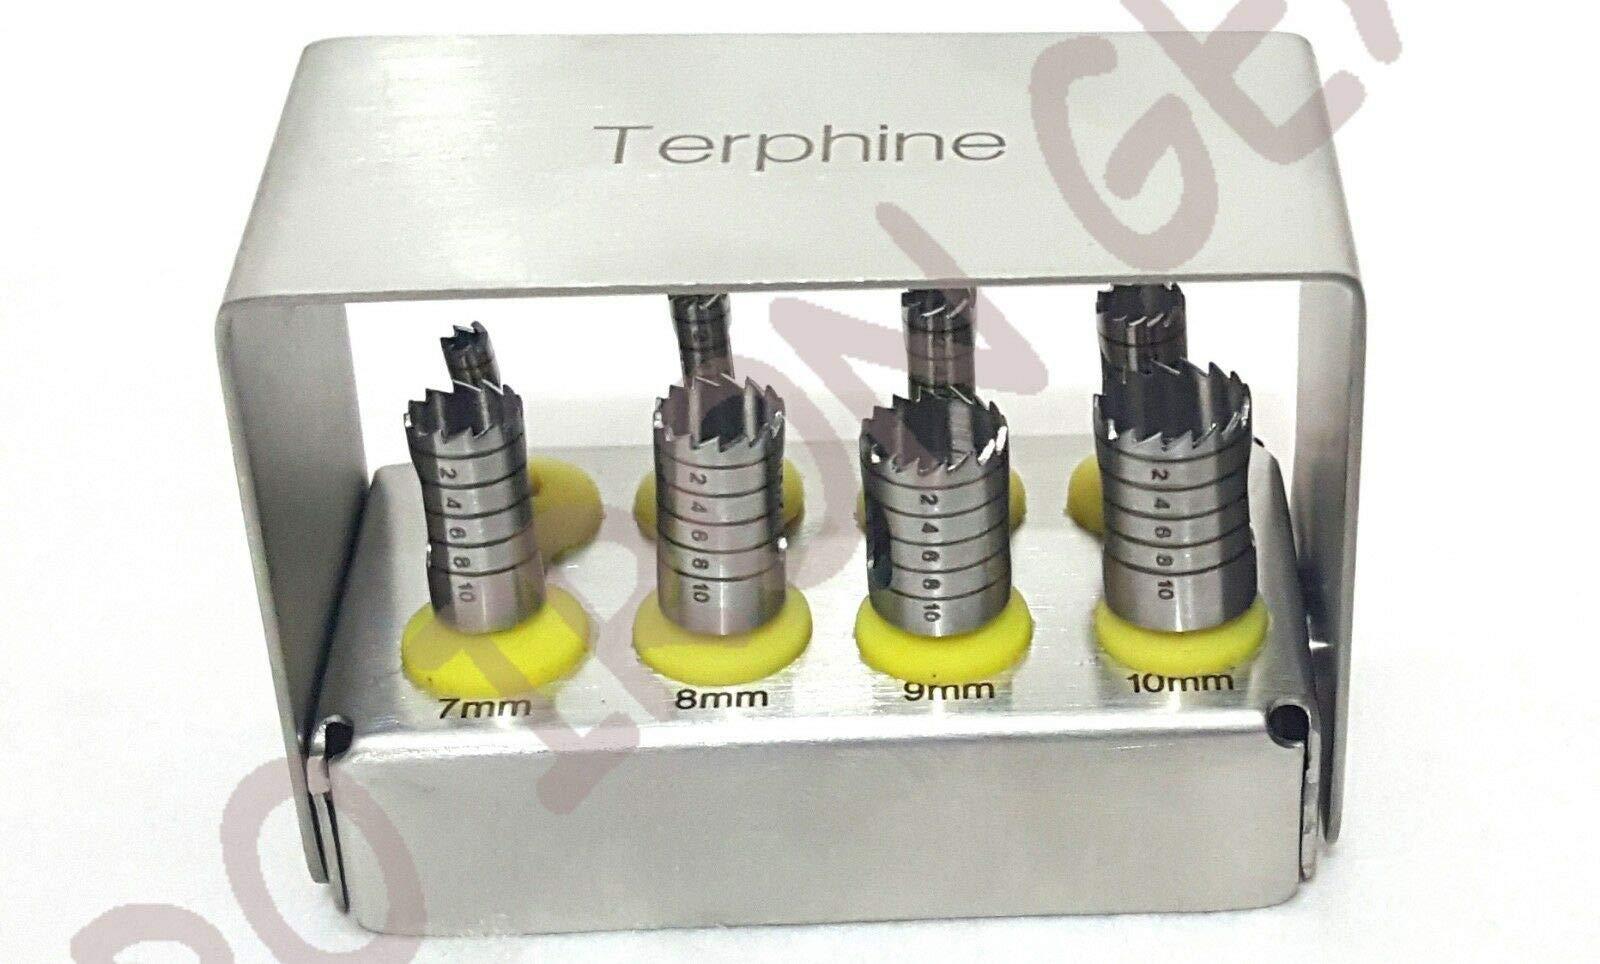 8 Pcs Trephine Drills Kit with Bur Holder